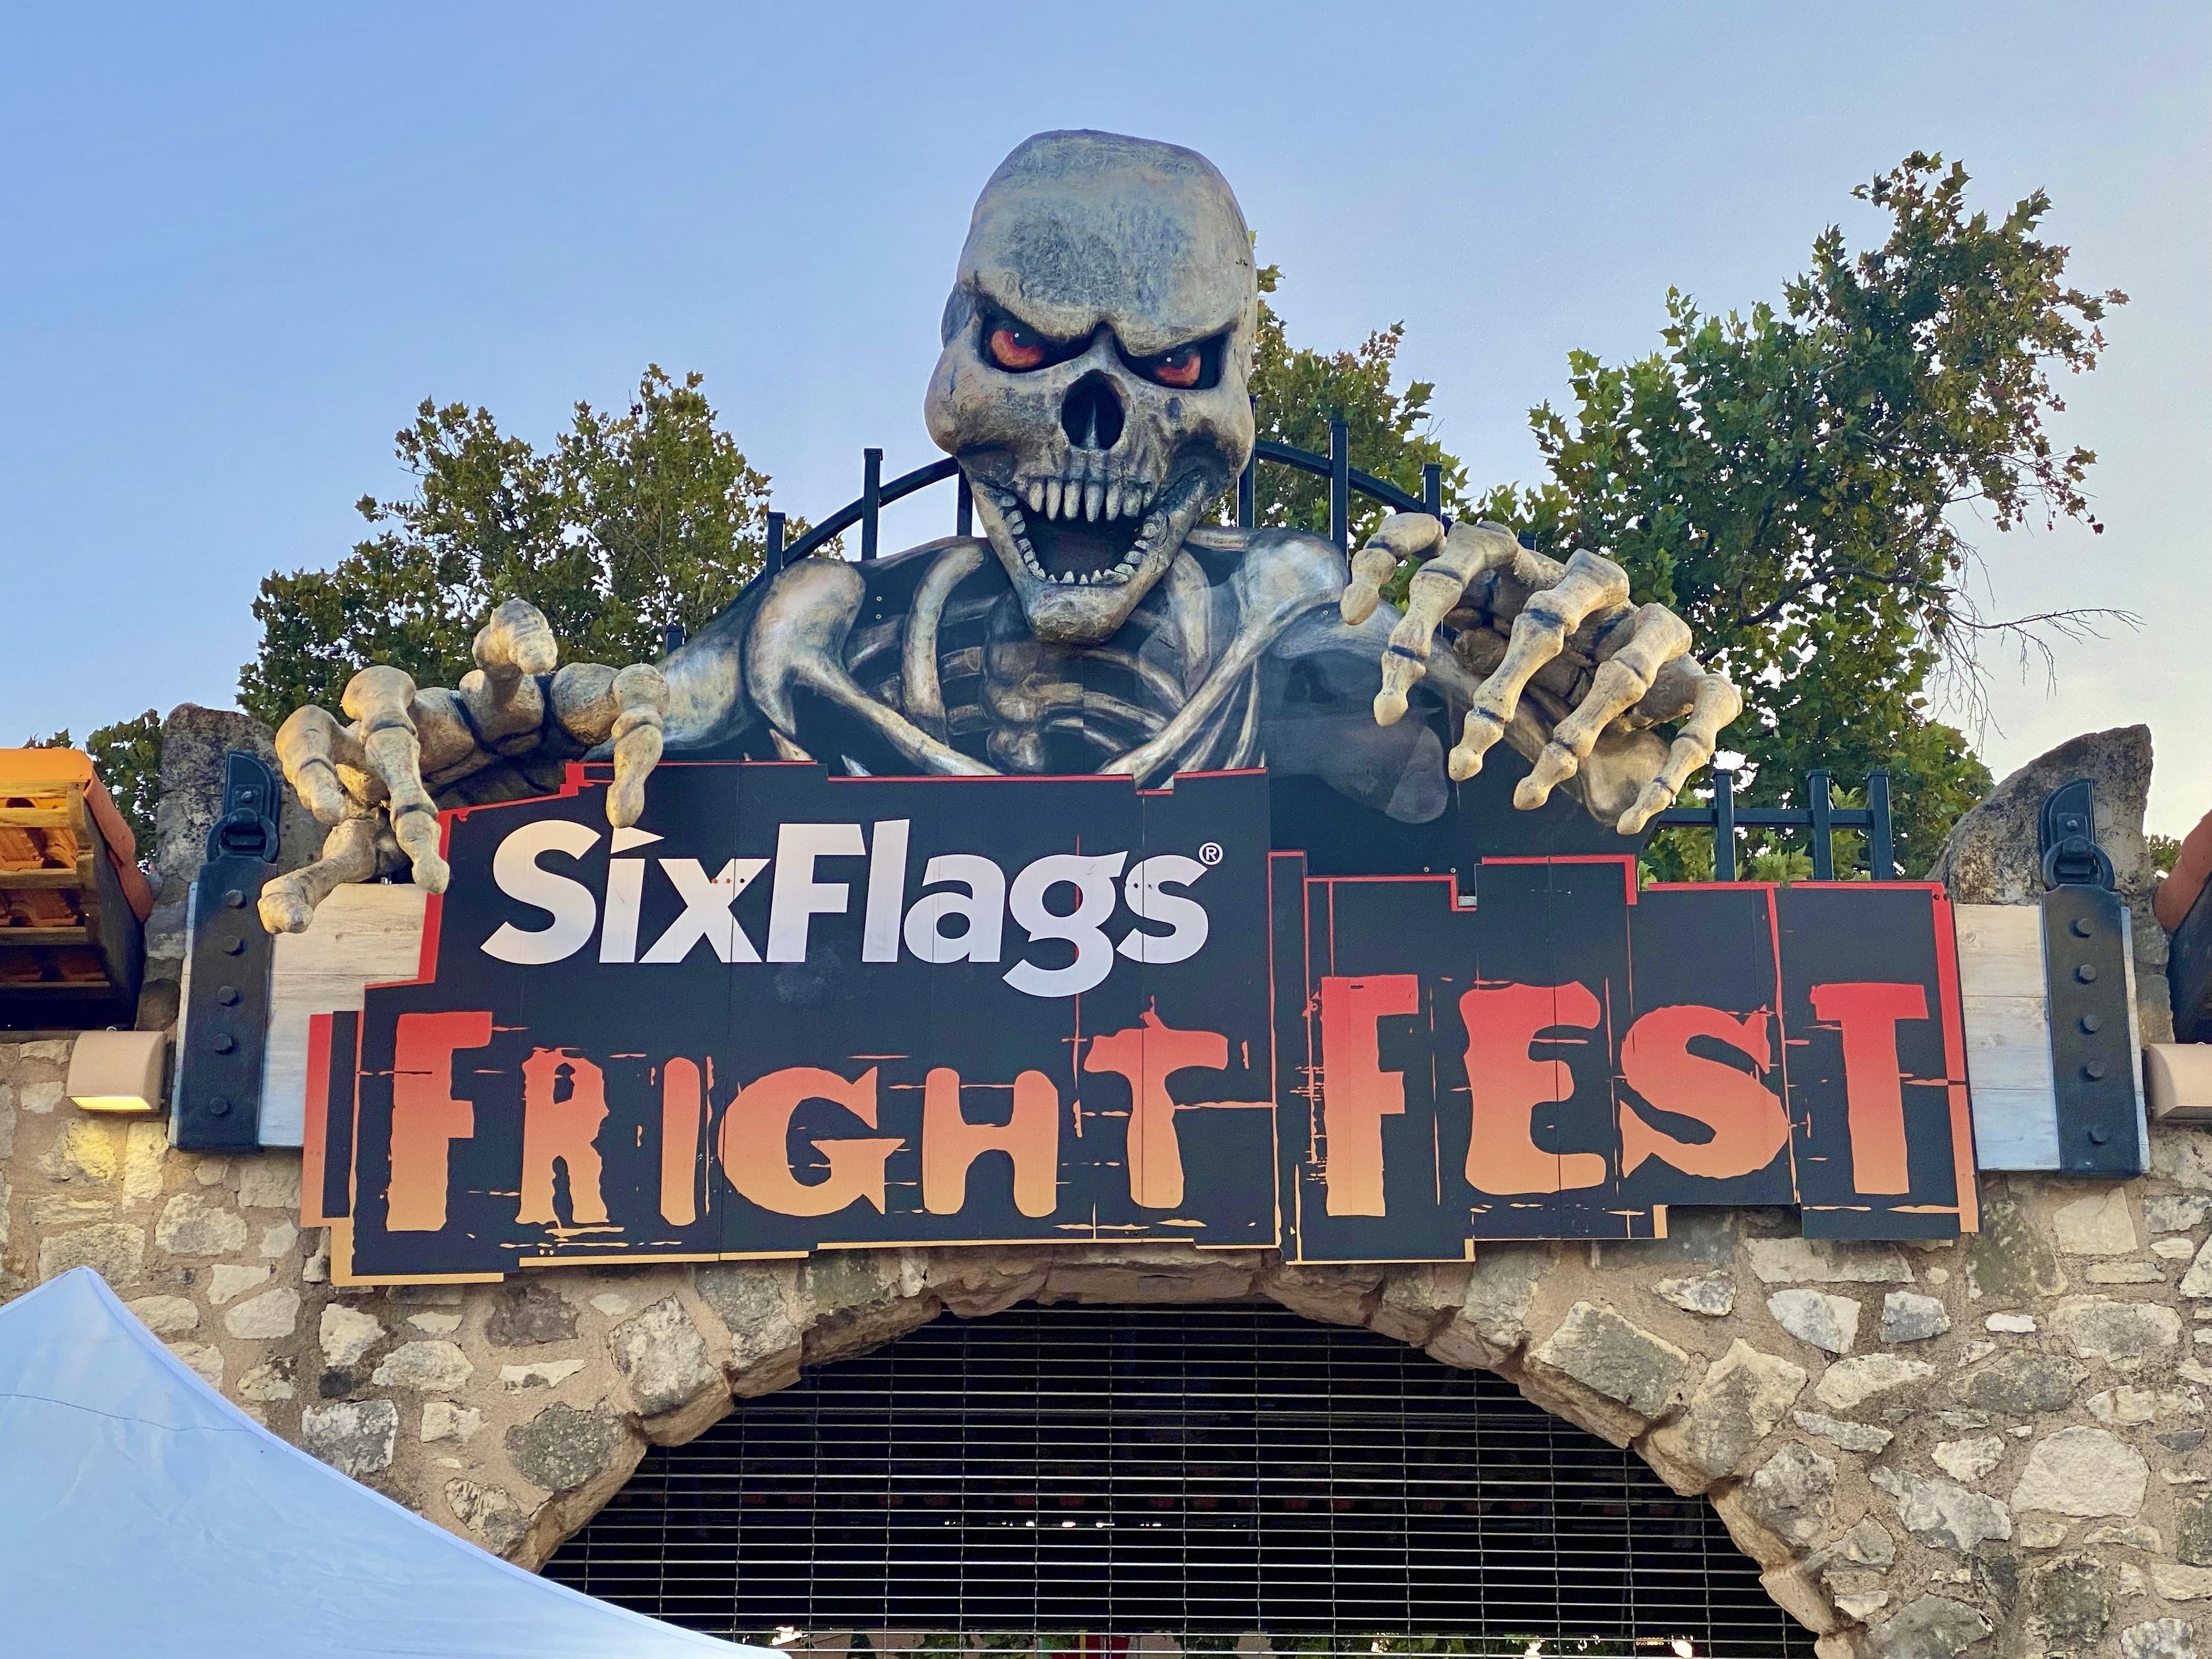 Fright Fest at Six Flags Fiesta Texas in San Antonio